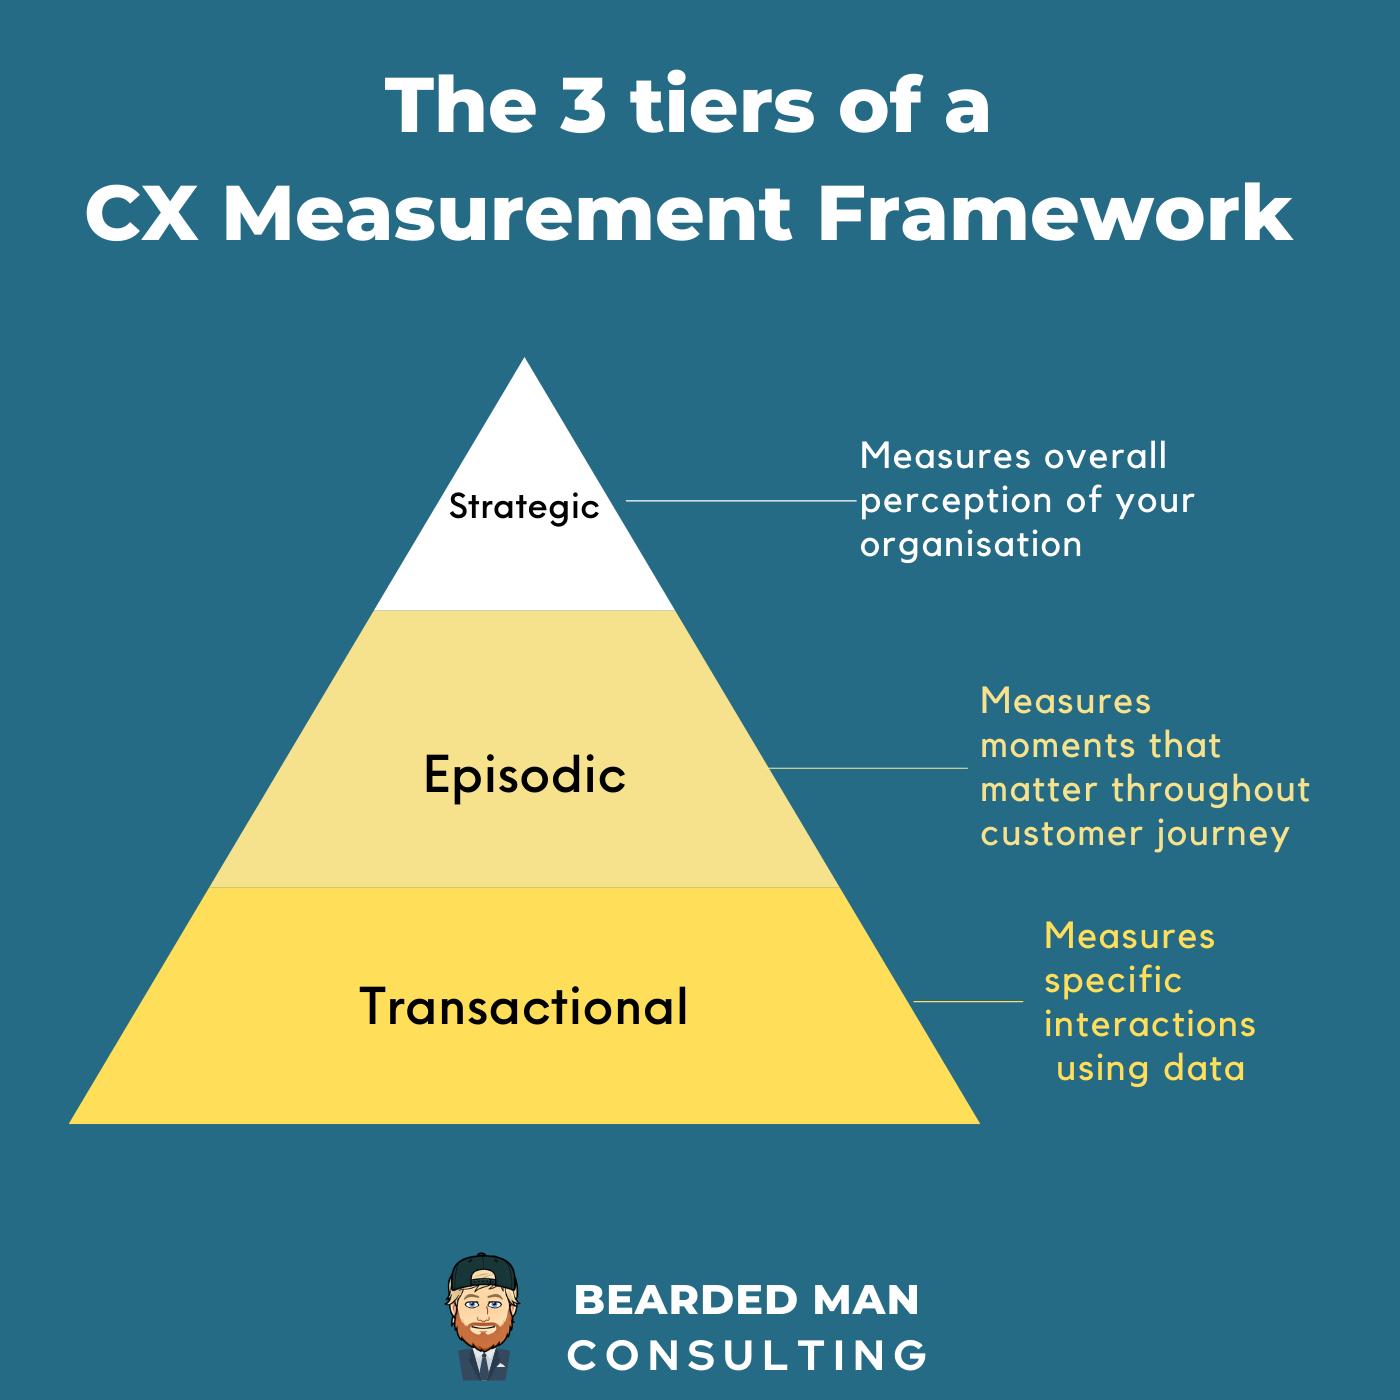 3 Tiers of a CXM Measurement Framework